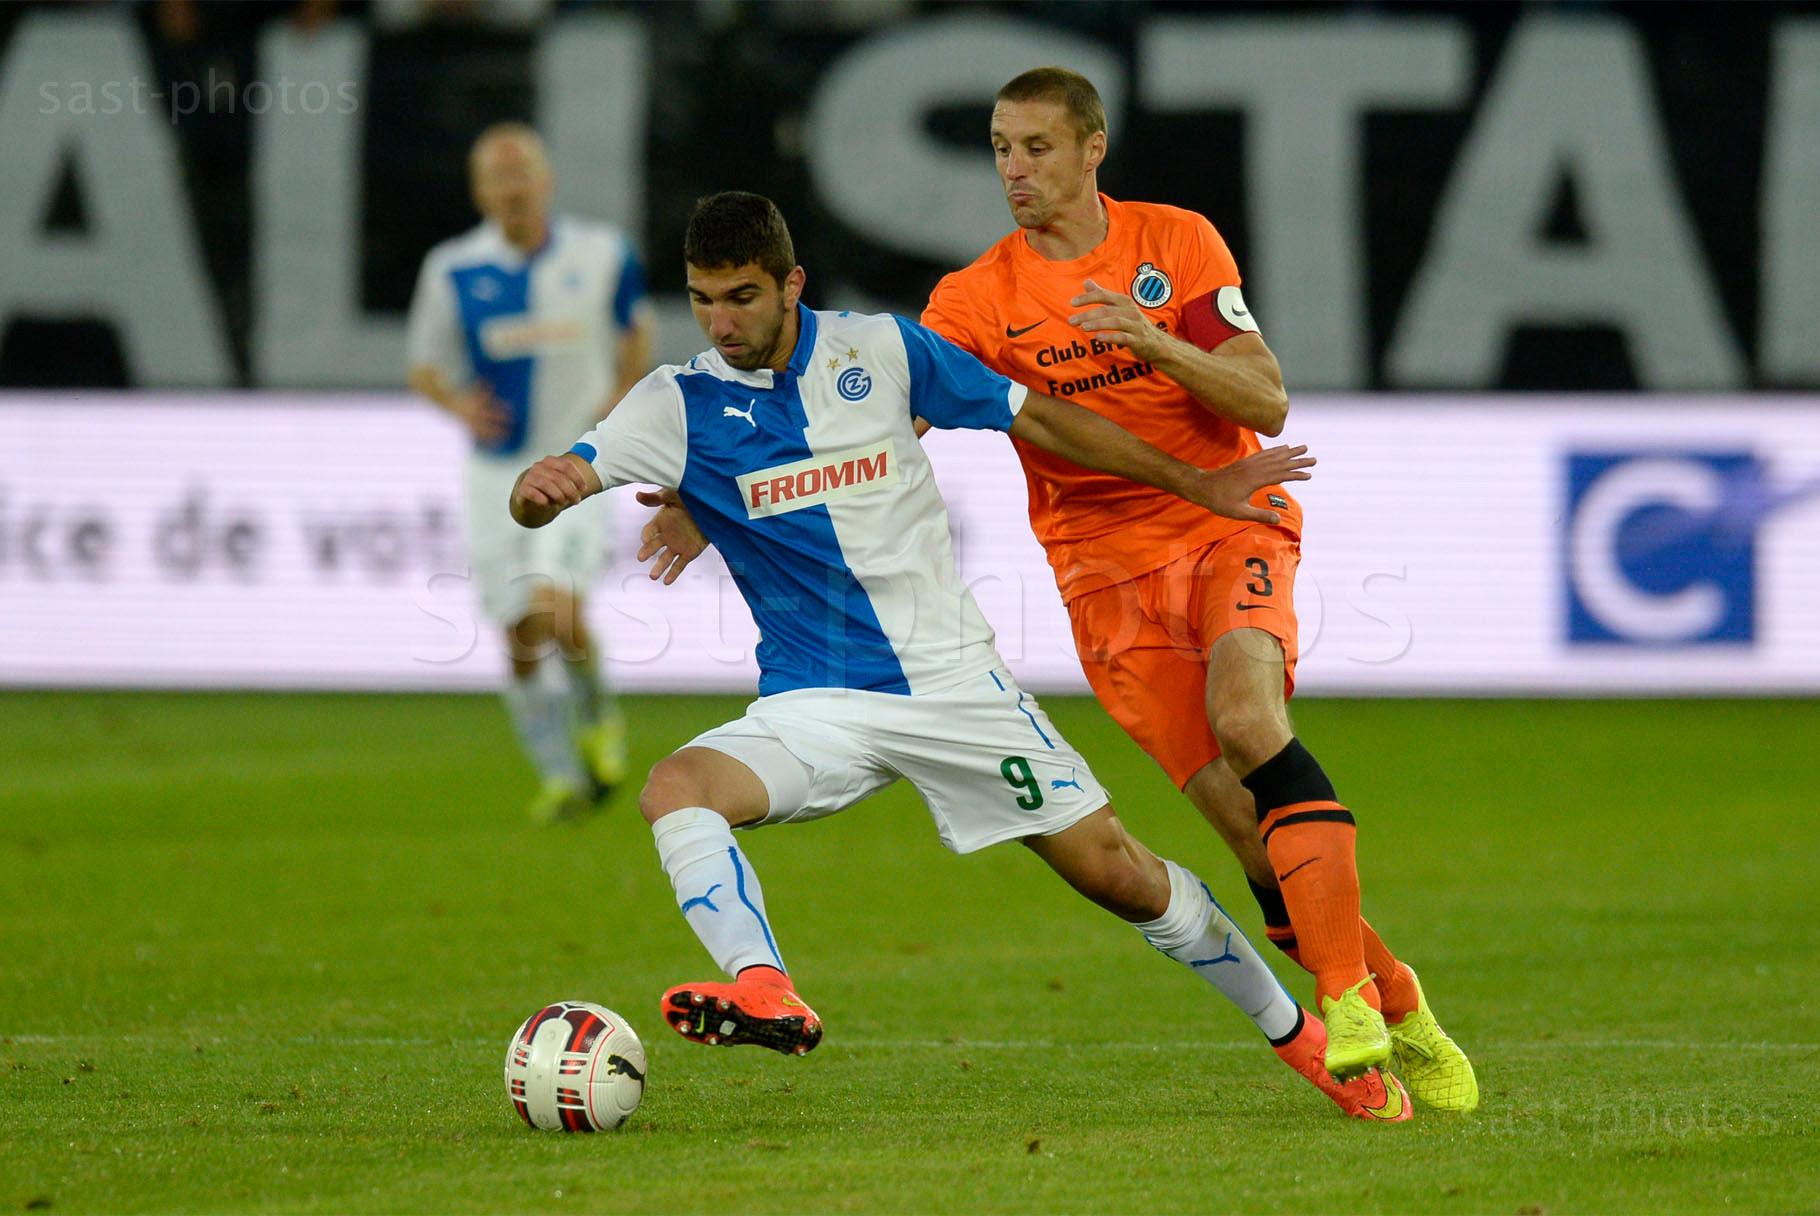 Munas Dabbur (L. GCZ) gegen Timmy Simons (Brugge)